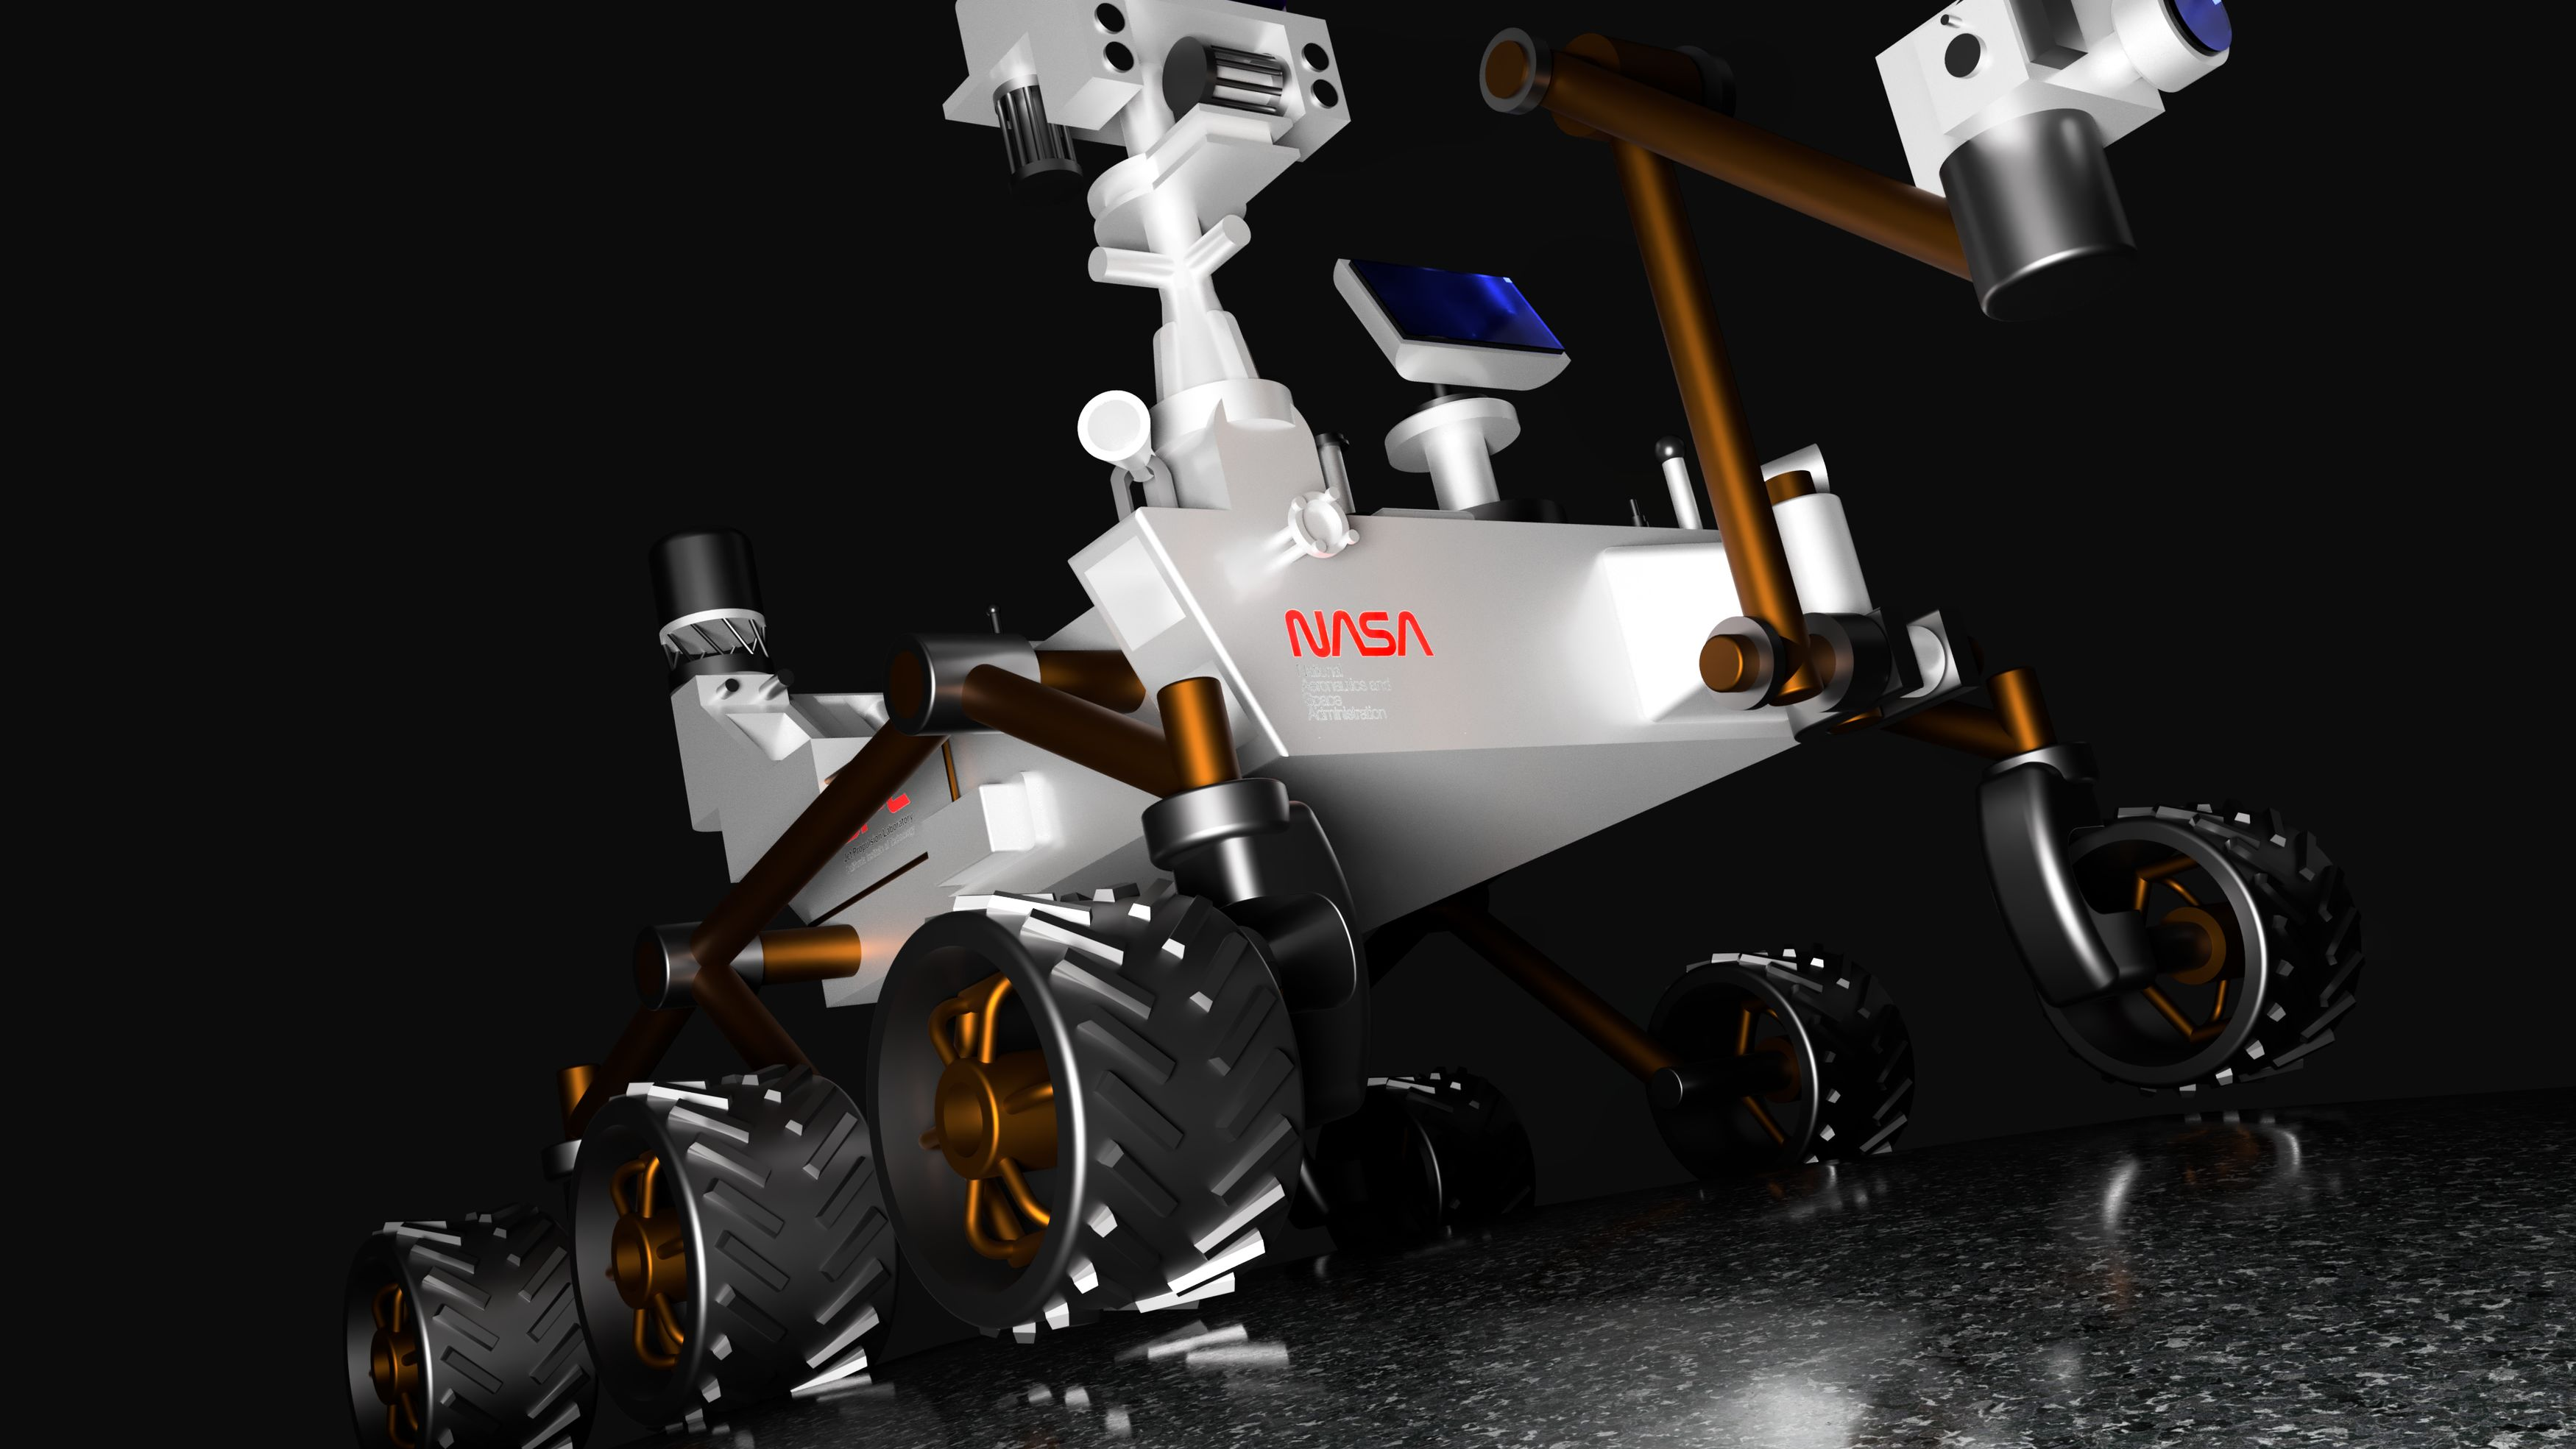 Robot-space-nasa---lcs2020-2020-may-06-10-51-31pm-000-customizedview11009372052-png-3500-3500